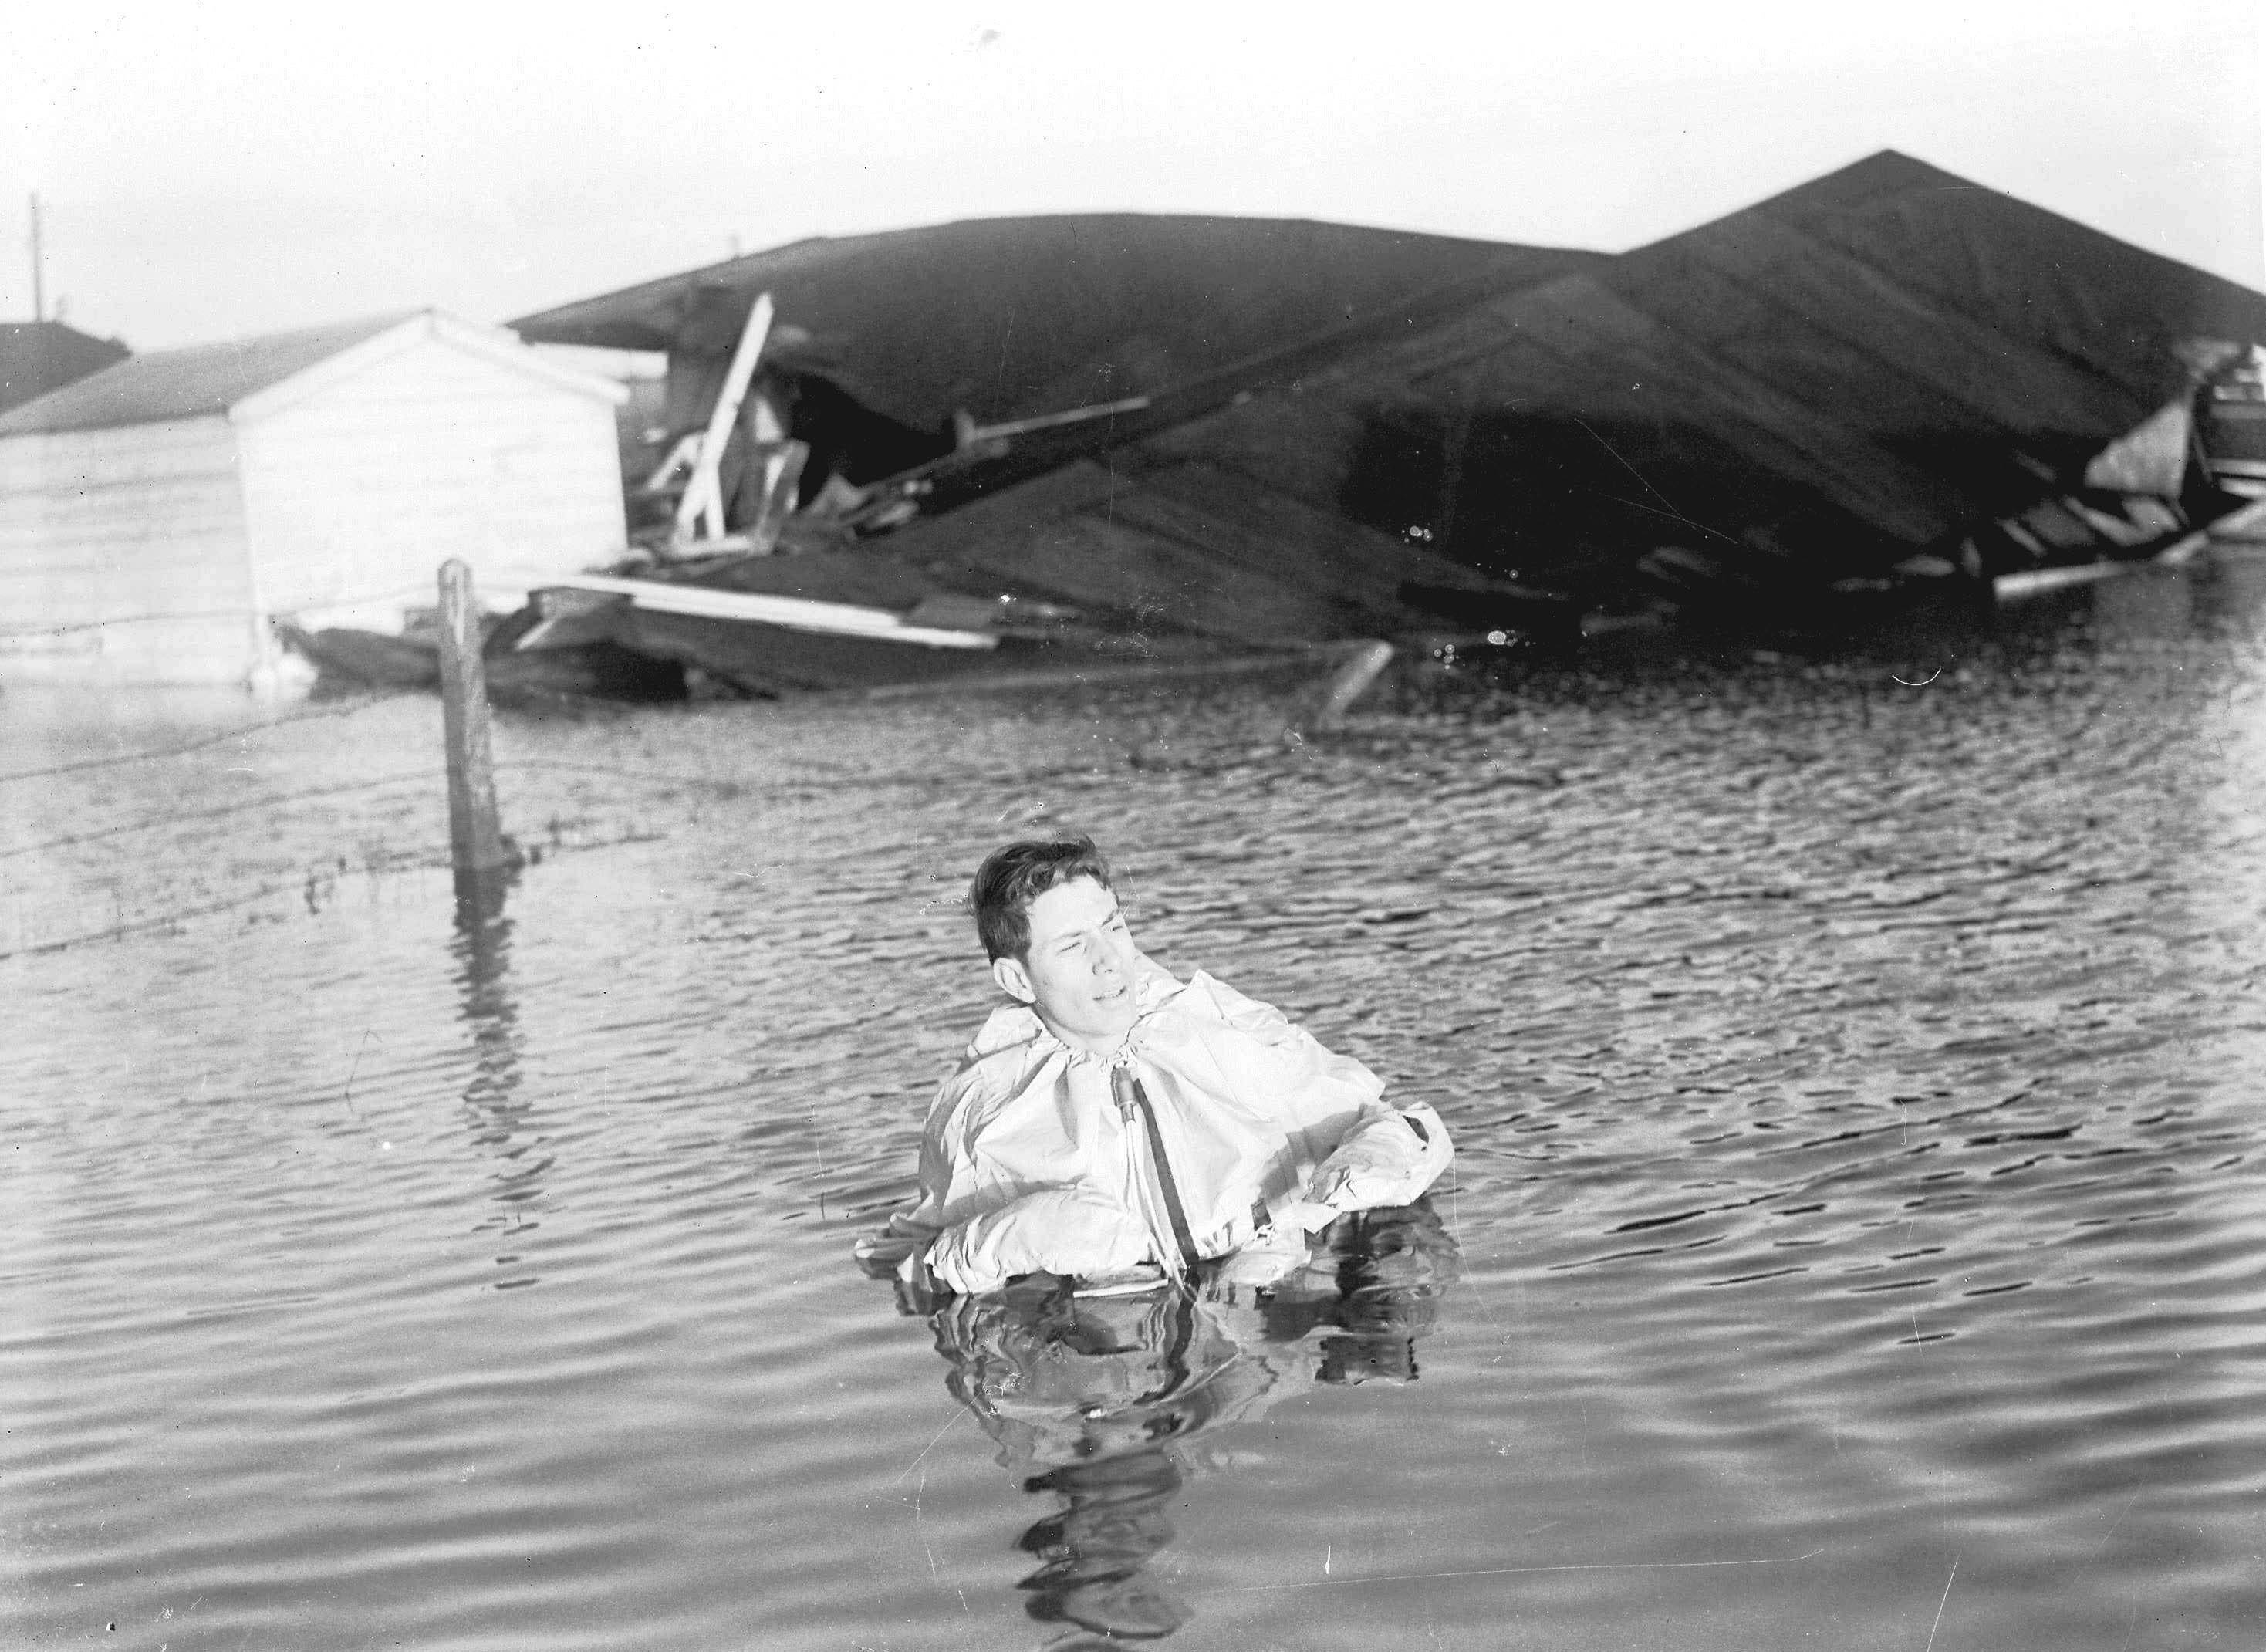 p0163_hunstanton_1953_floods[1].jpg